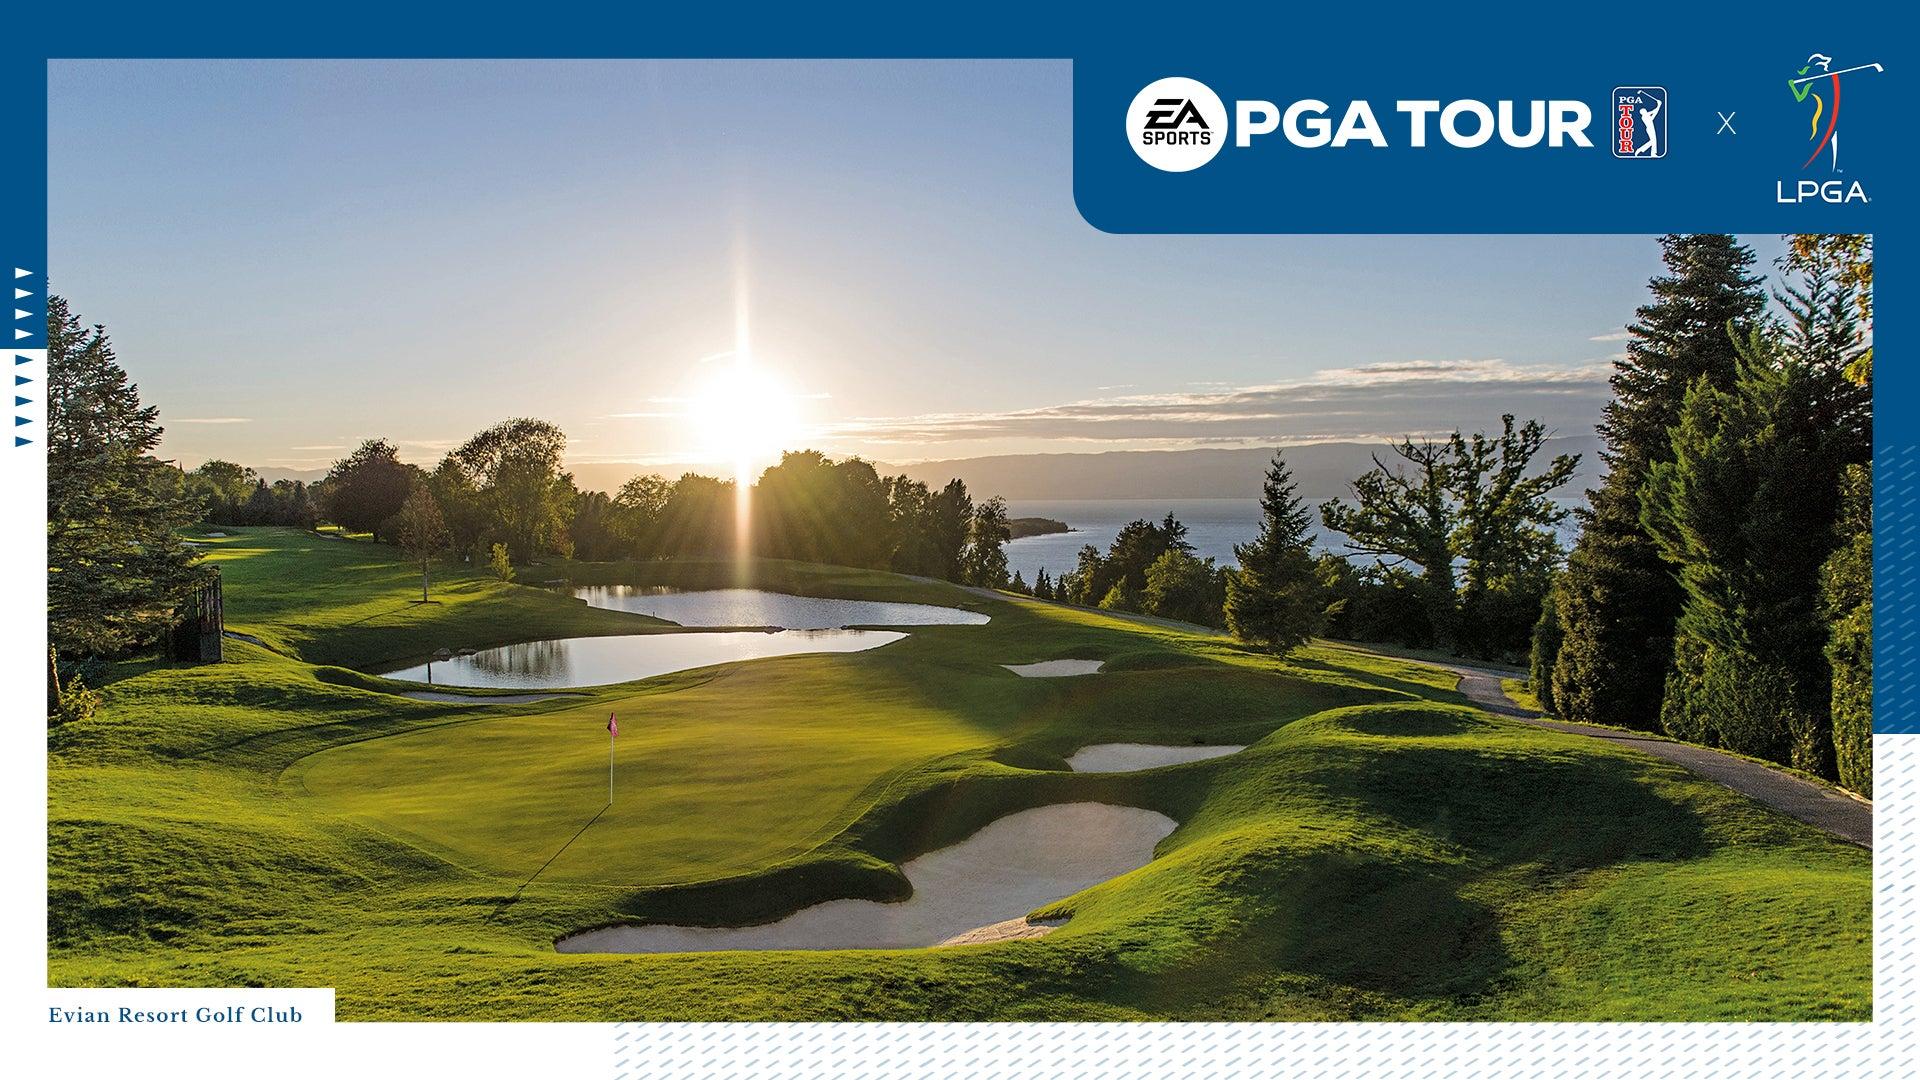 Image for EA Sports PGA Tour to include LPGA Players and Amundi Evian Championship